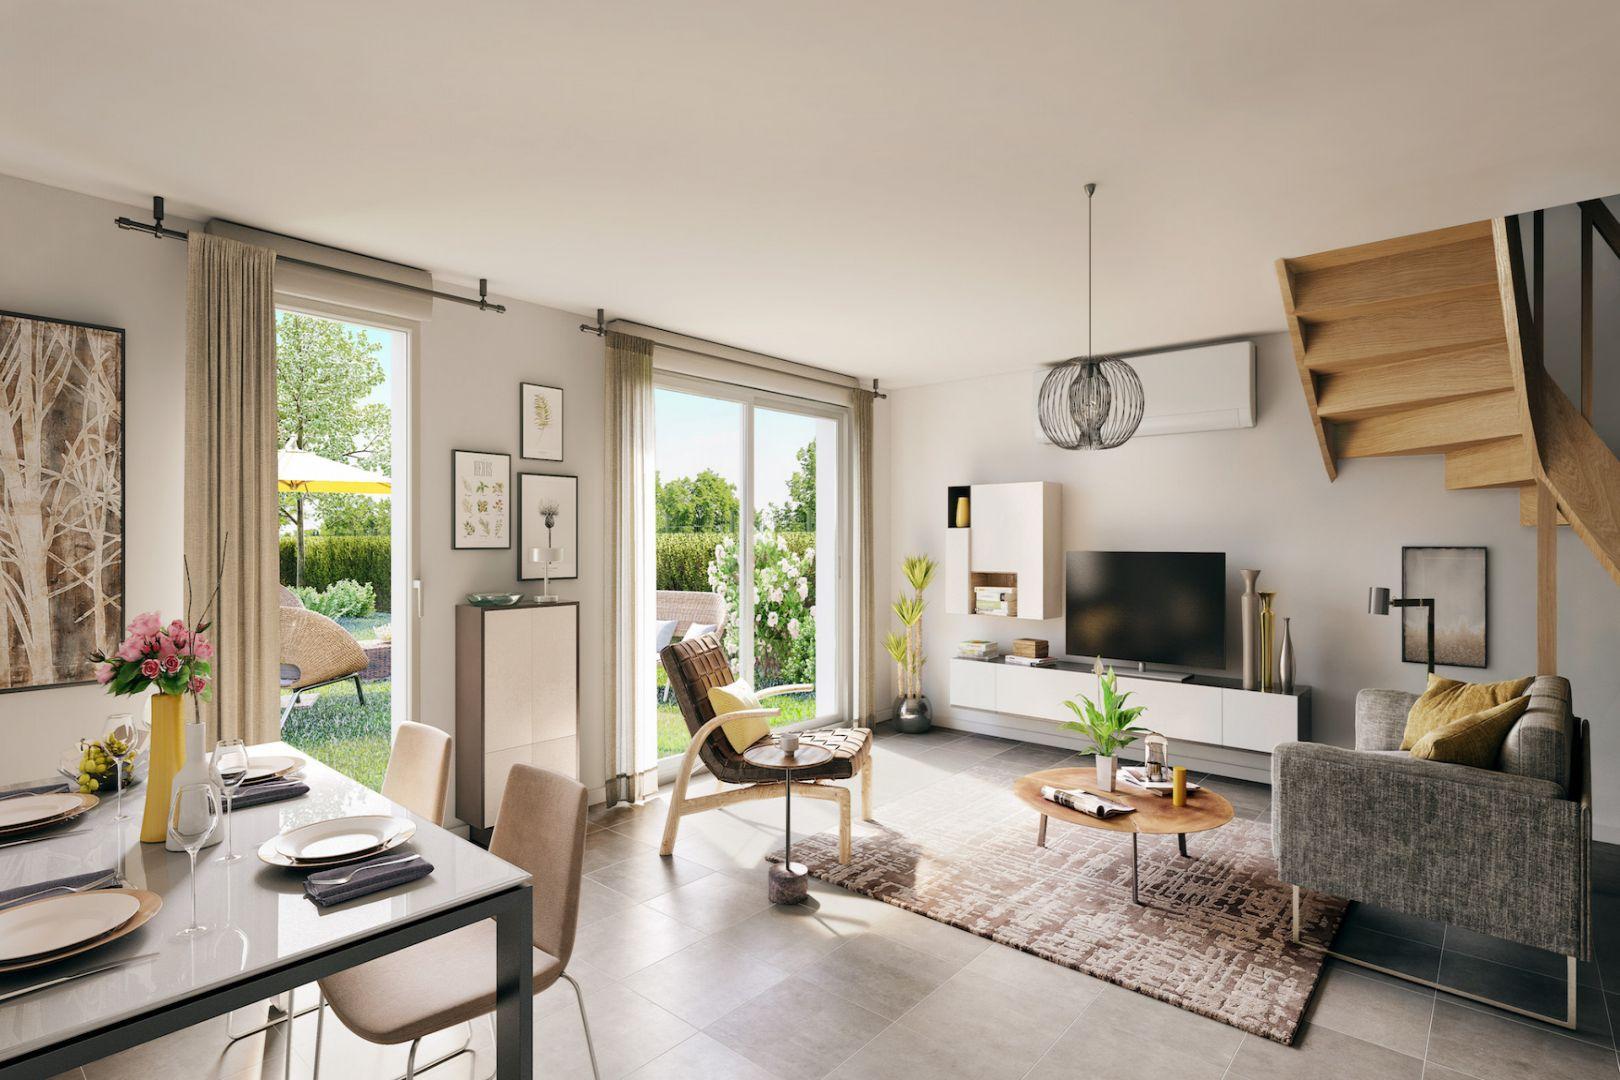 maison grimaud location ventana blog. Black Bedroom Furniture Sets. Home Design Ideas